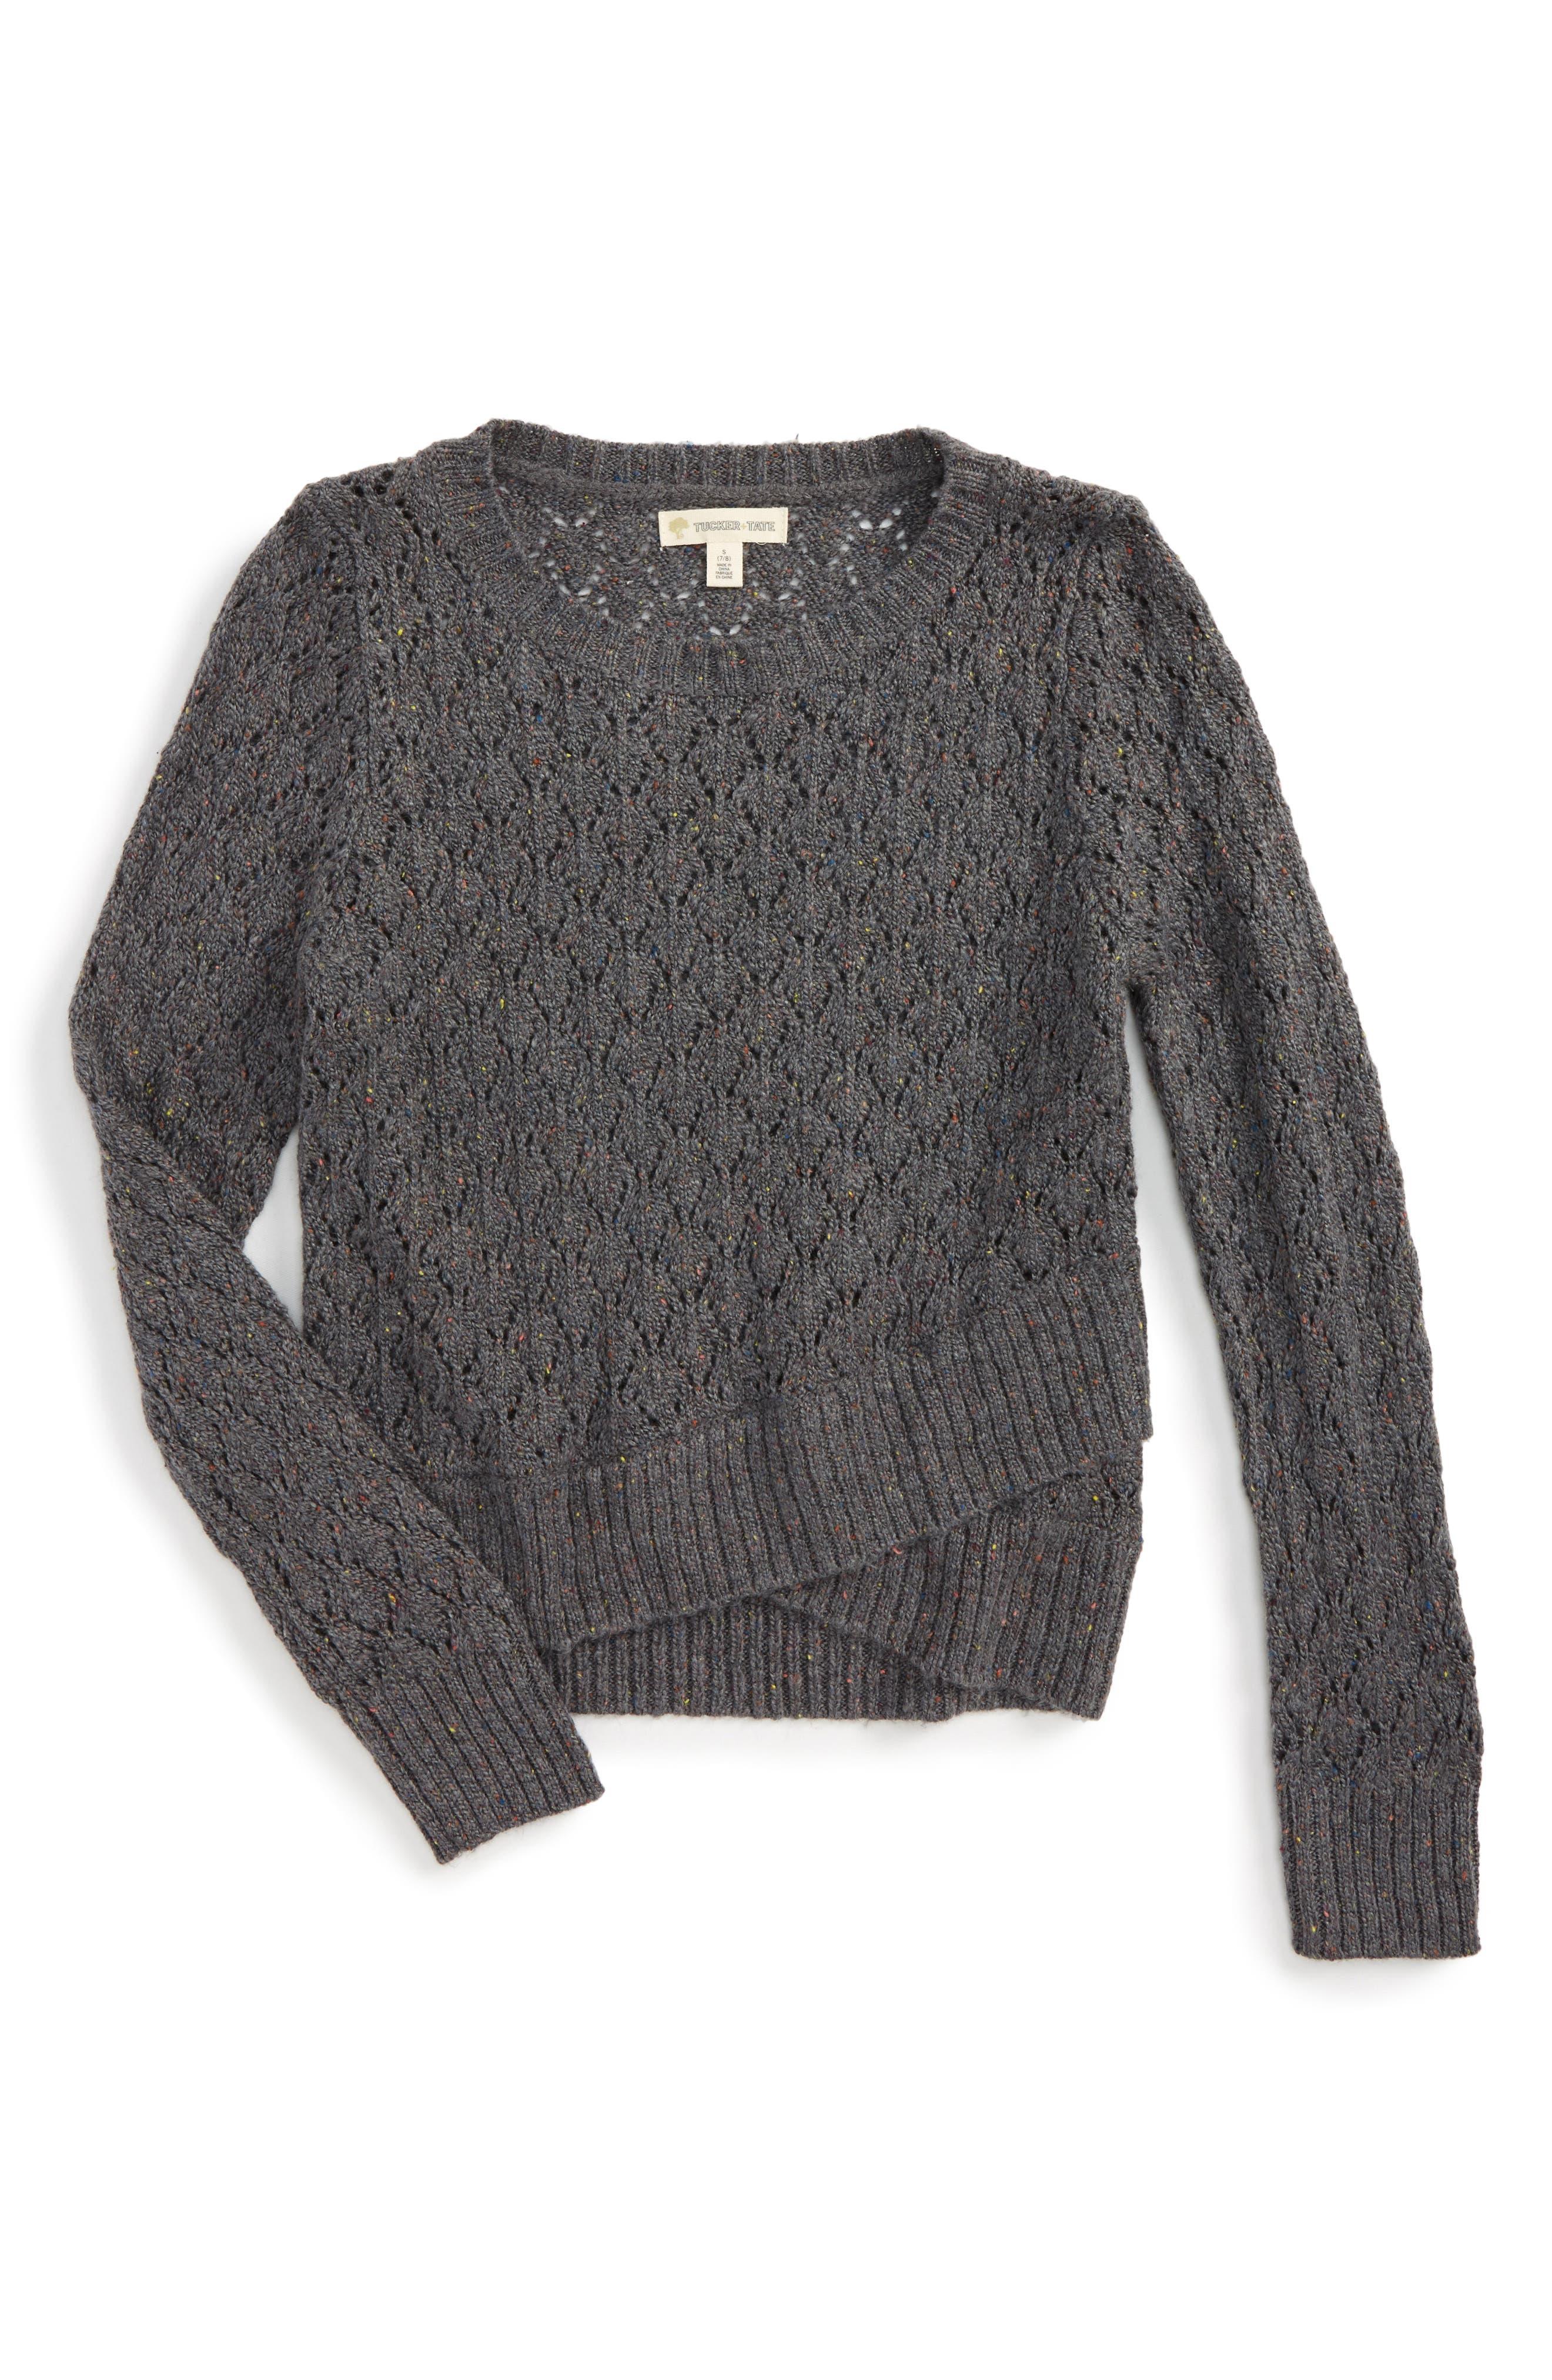 TUCKER + TATE Cross Front Sweater